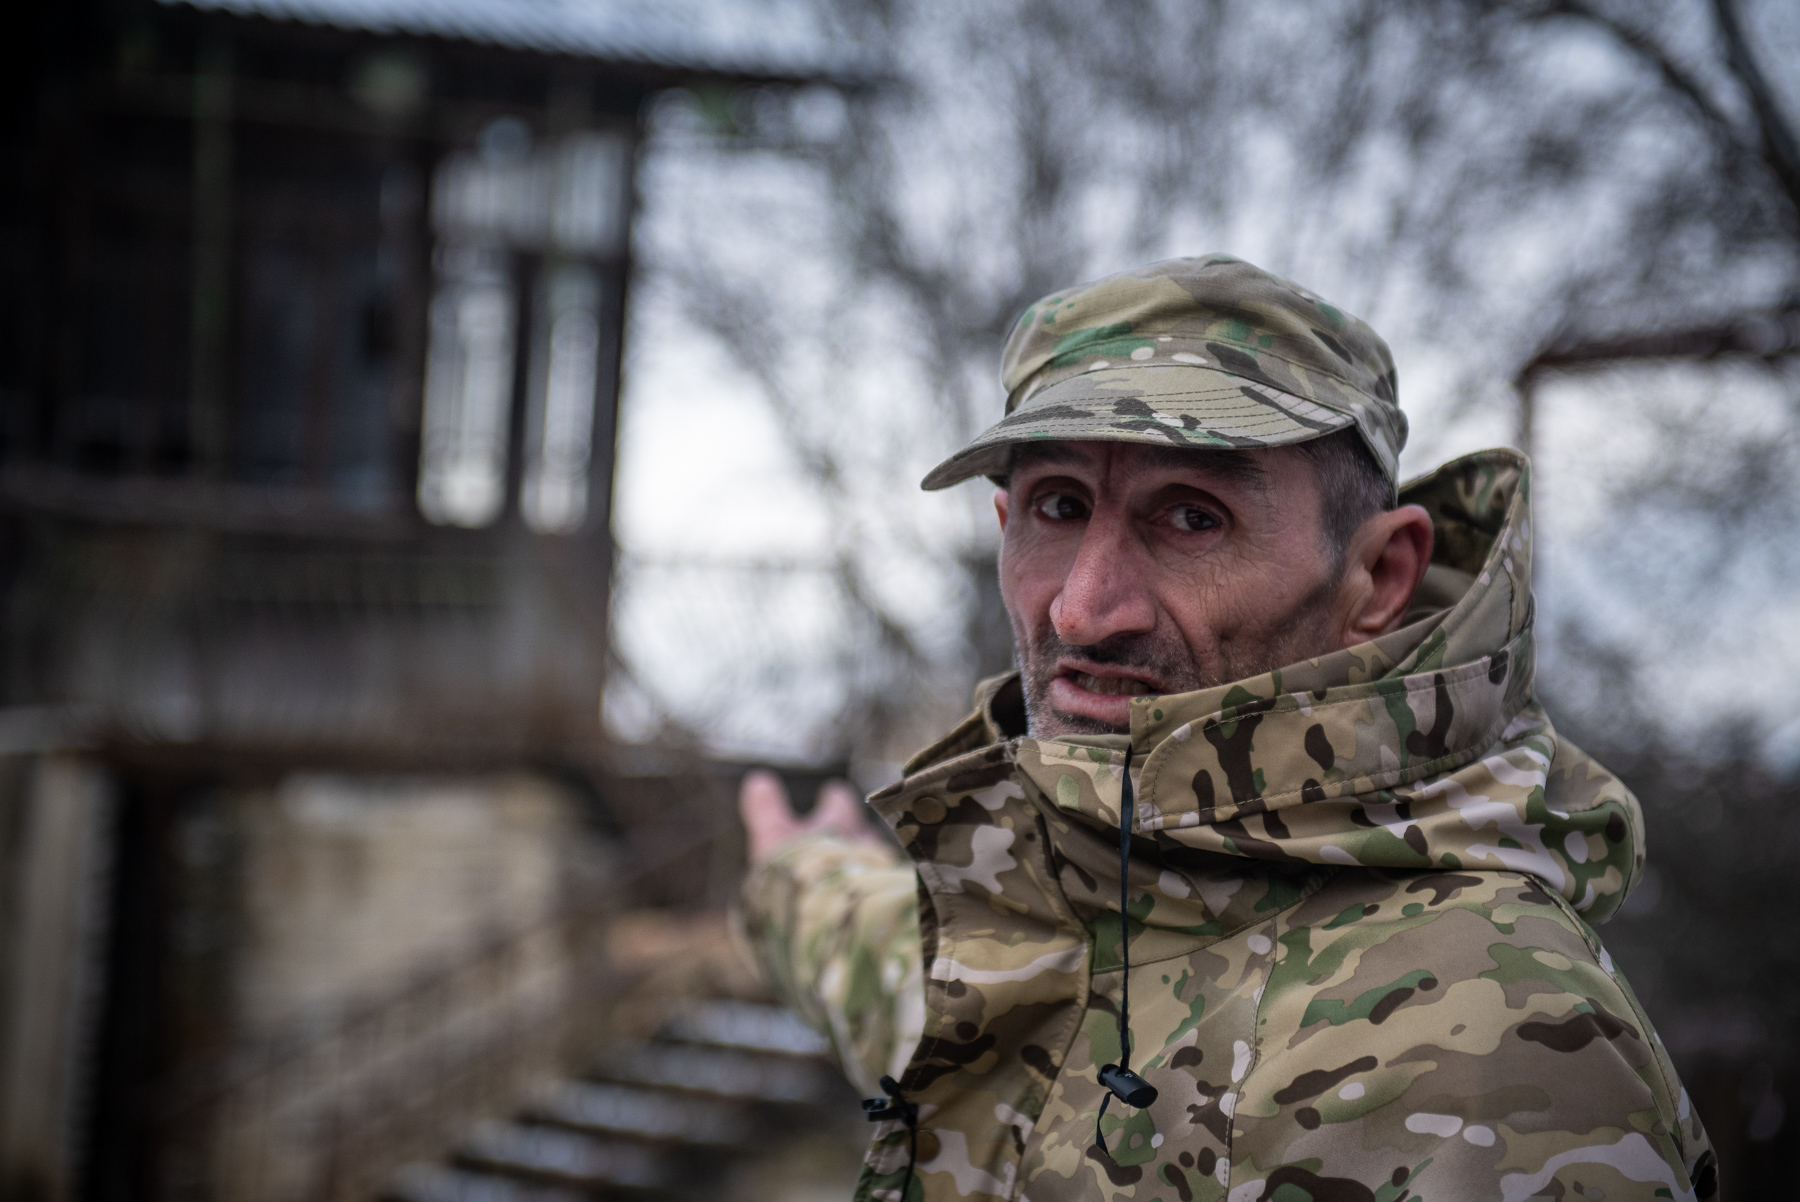 Levan Shekiladze. Photo: Mariam Nikuradze/OC Media.